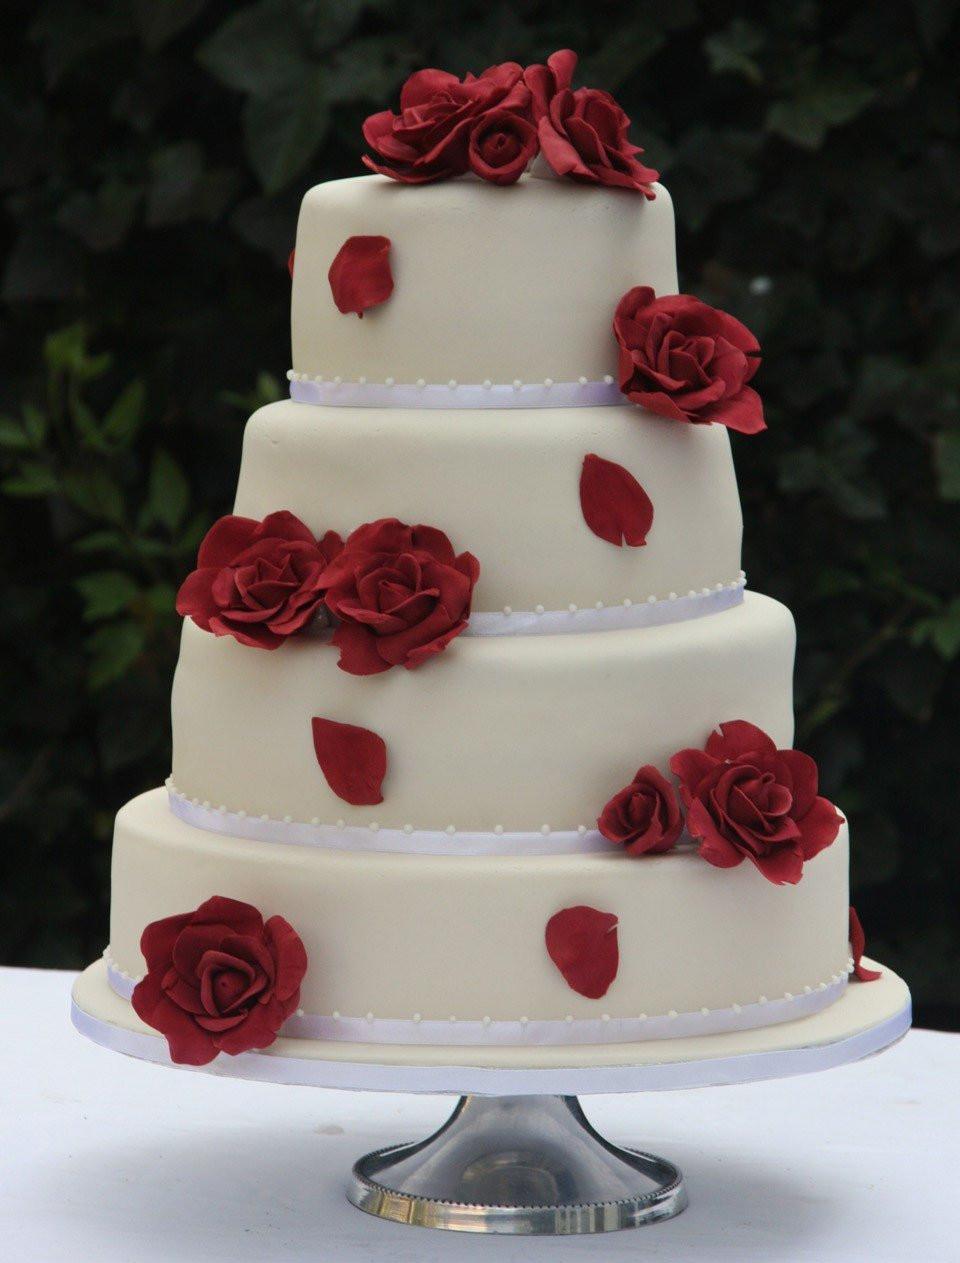 Bruidstaart Rode Rozen Theperfectwedding Nl